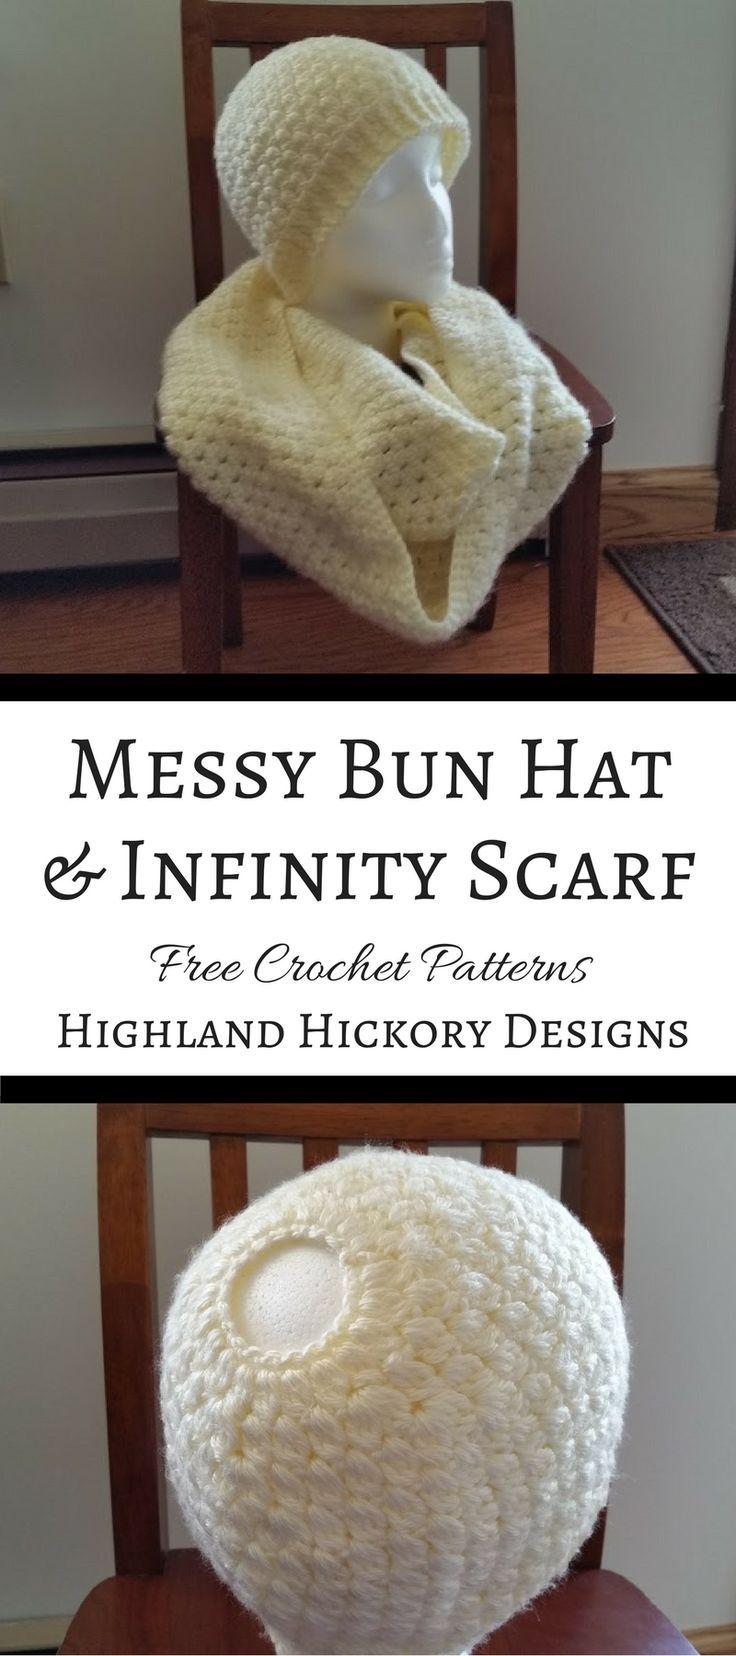 Jess Mess-y Bun Hat - Free Crochet Pattern | Ponchos y Tejido